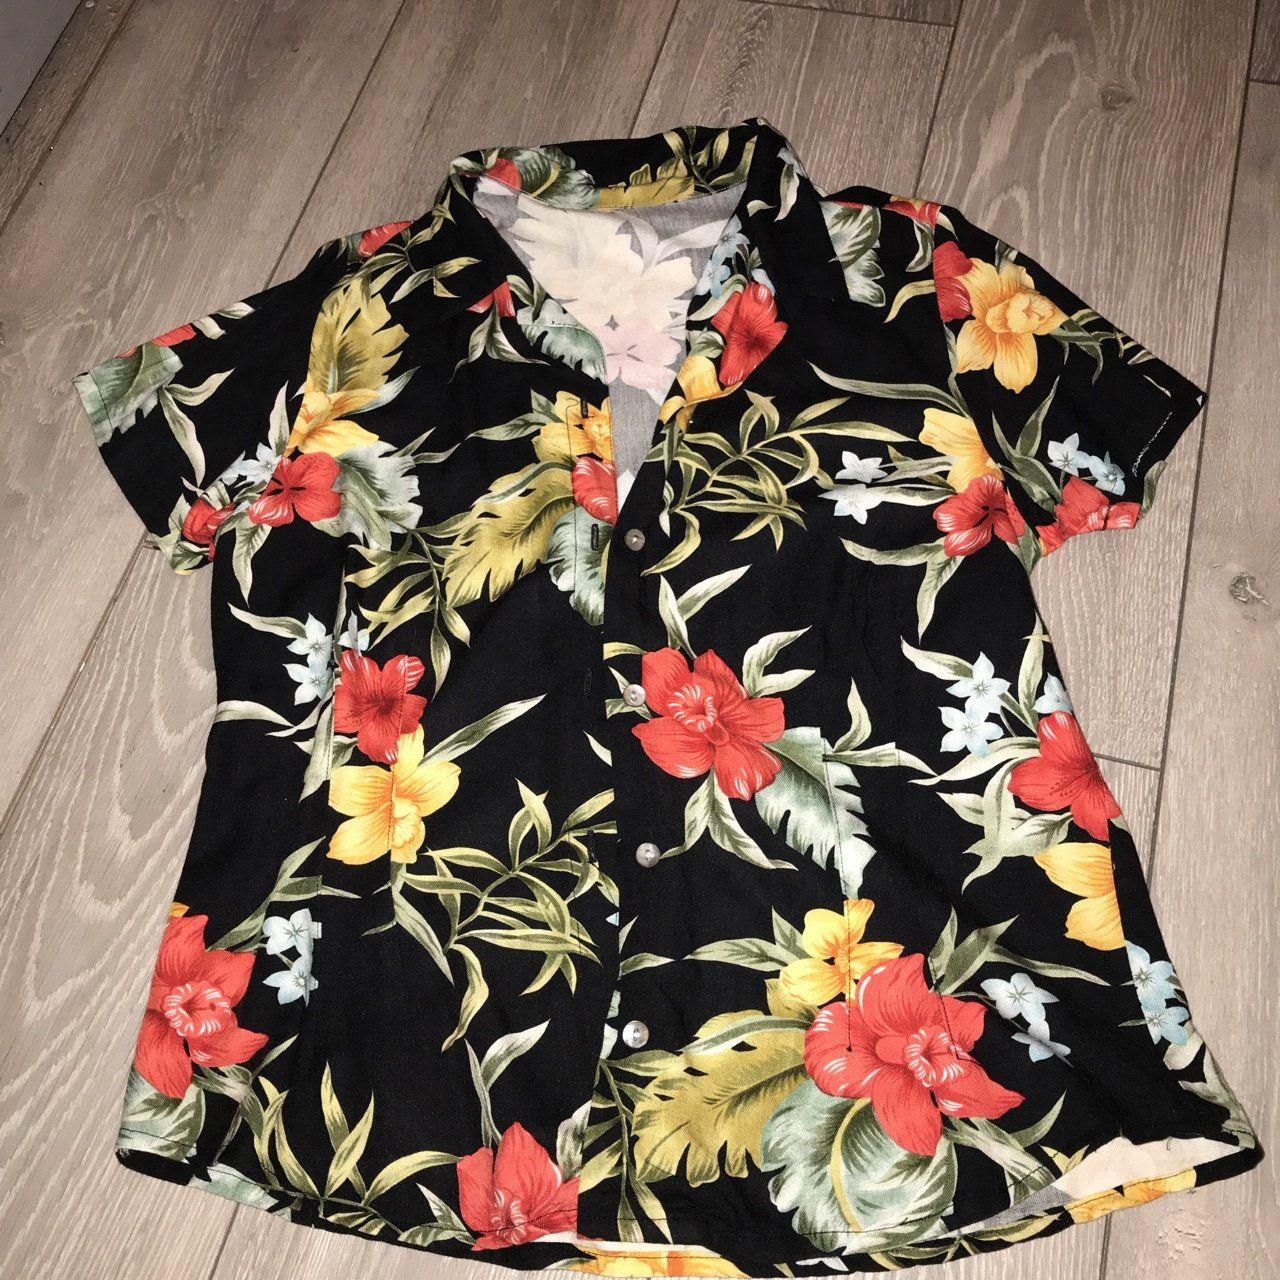 6a300e74 Listed on Depop by masummeah   Xmas 2k18   Shirts, Depop, Down shirt